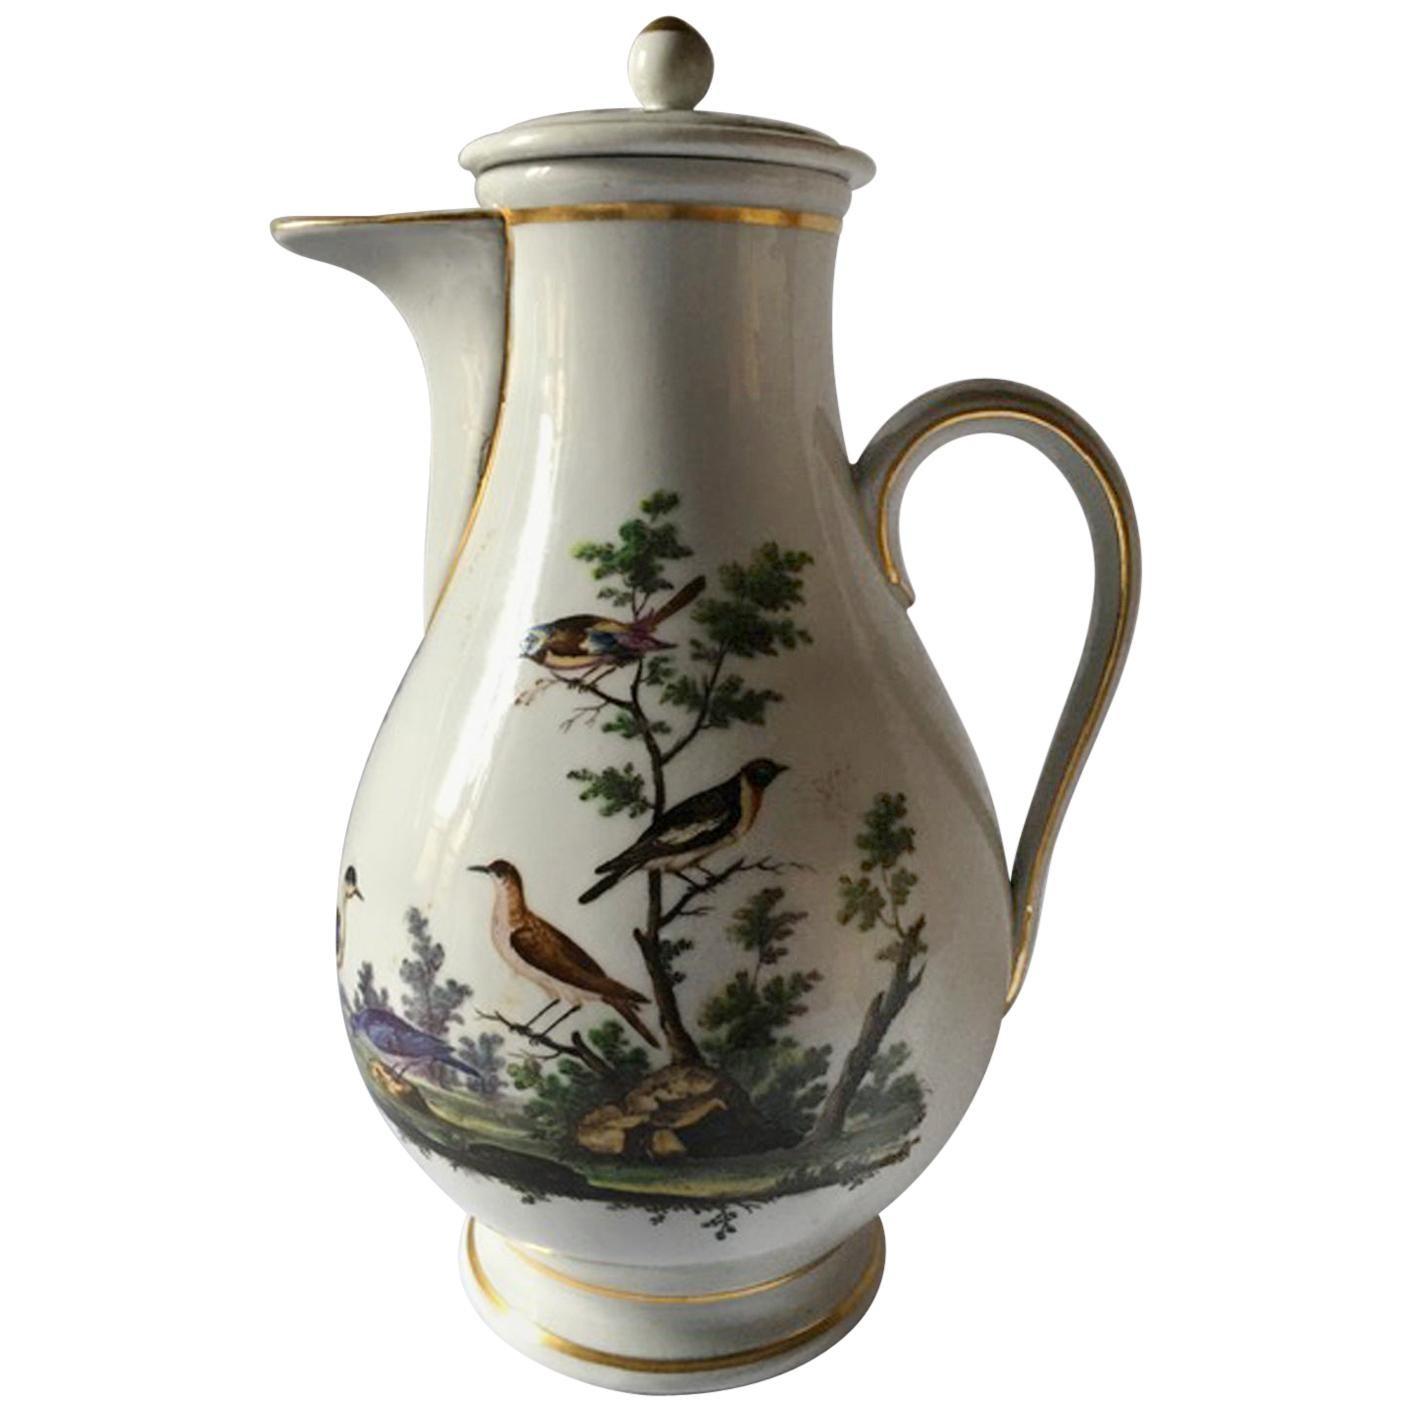 Italy Richard Ginori Mid-18th Century Porcelain Coffee Pot